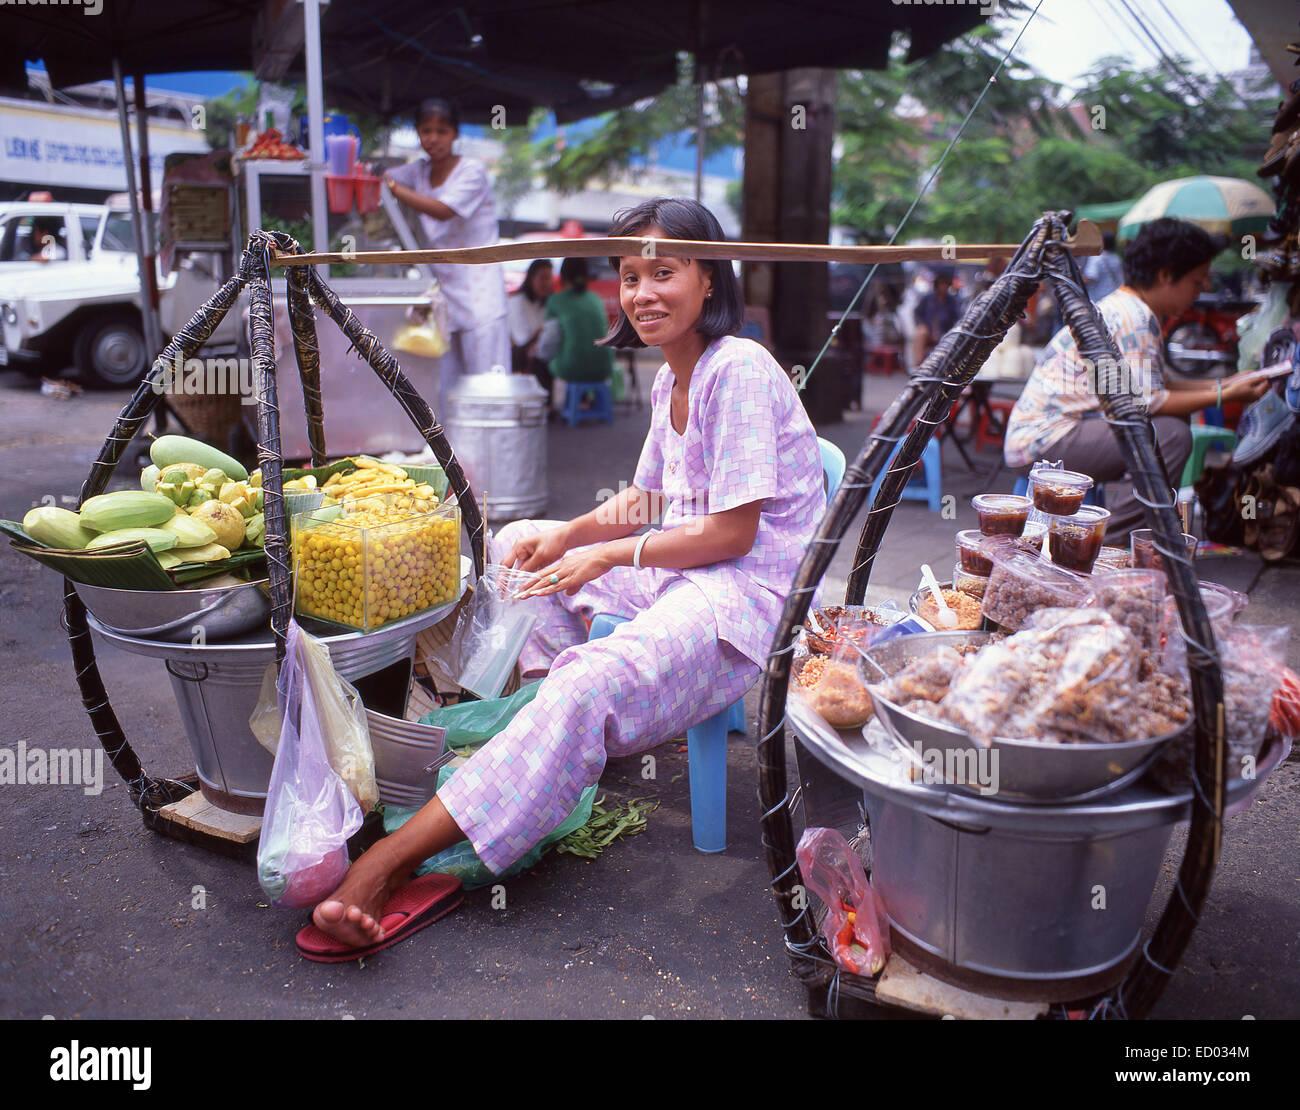 Woman selling fruits, Bình Tây Market, Cholon, District 6, Ho Chi Minh City (Saigon), Socialist Republic - Stock Image